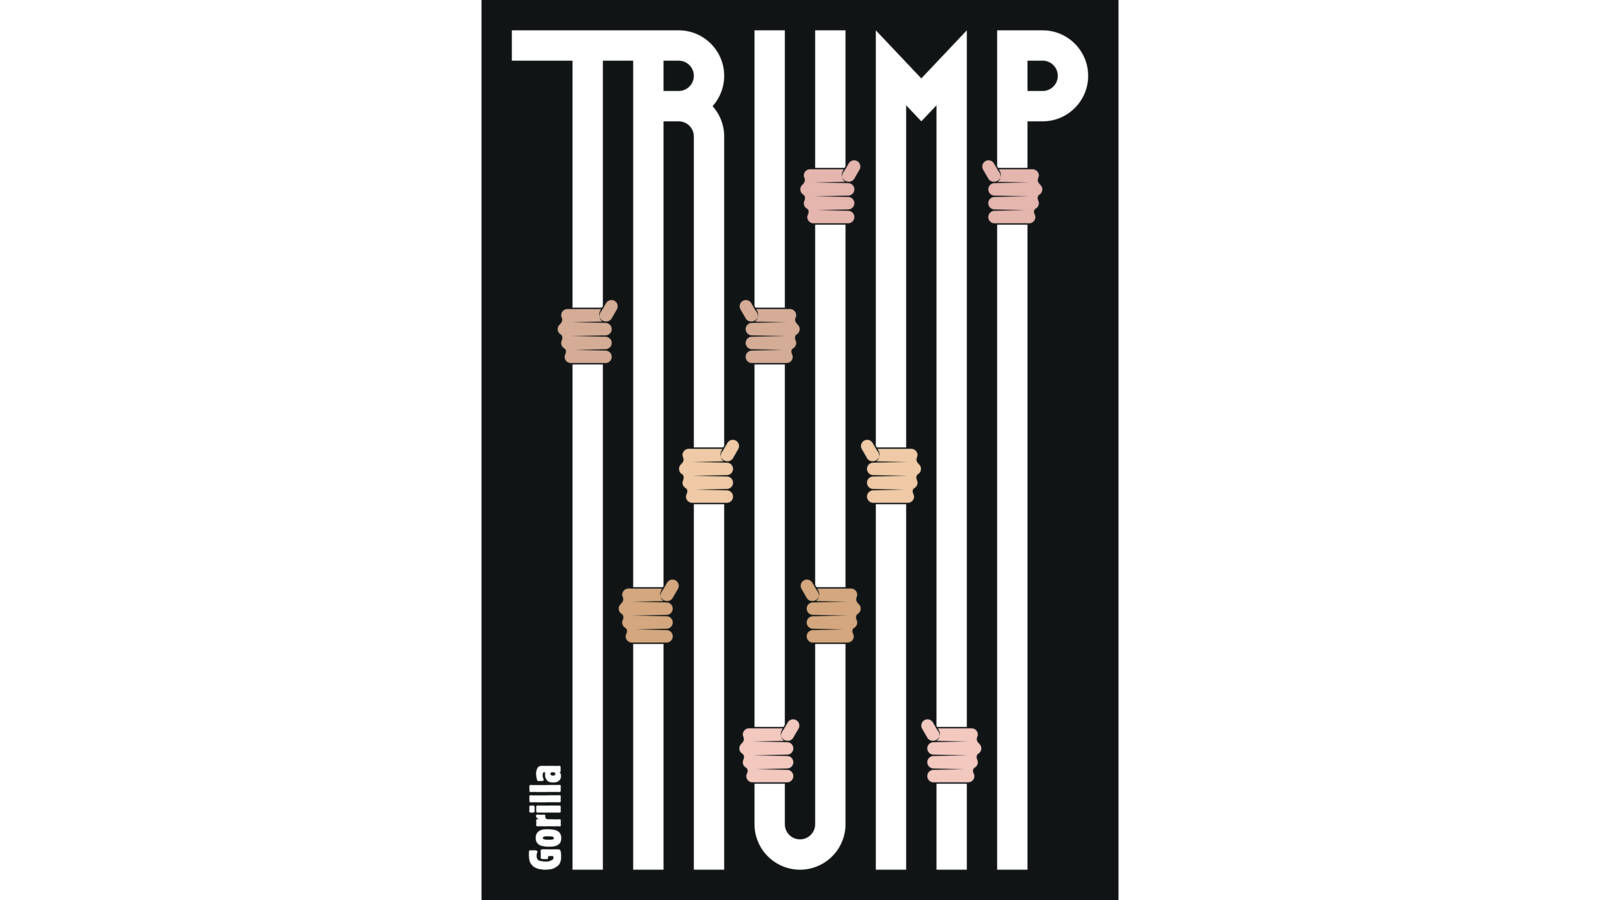 Trump jails immigrant children, cartoon by Gorilla